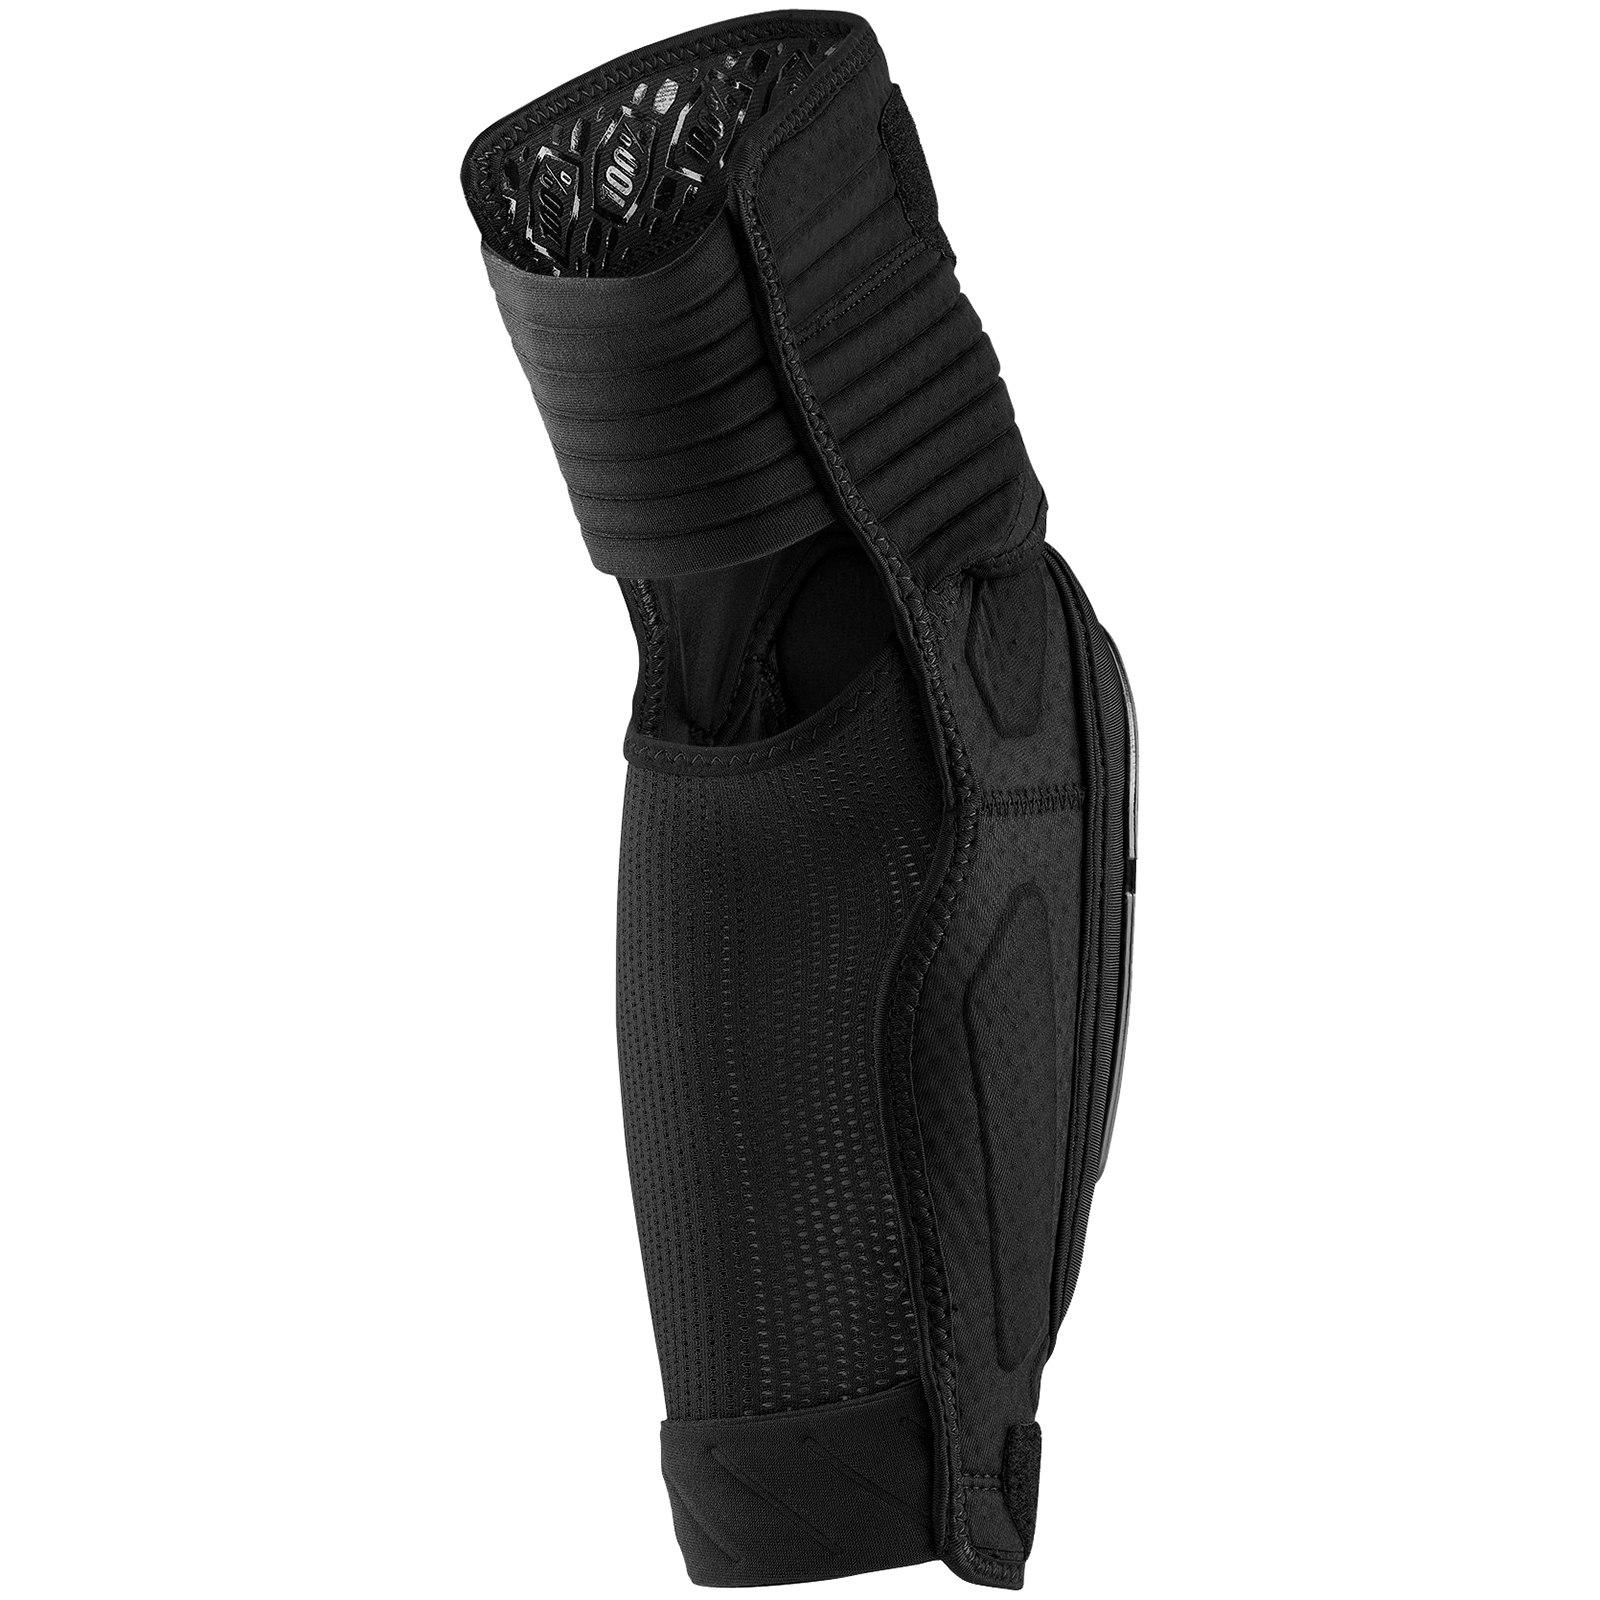 Imagen de 100% Fortis Elbow Guard - Black